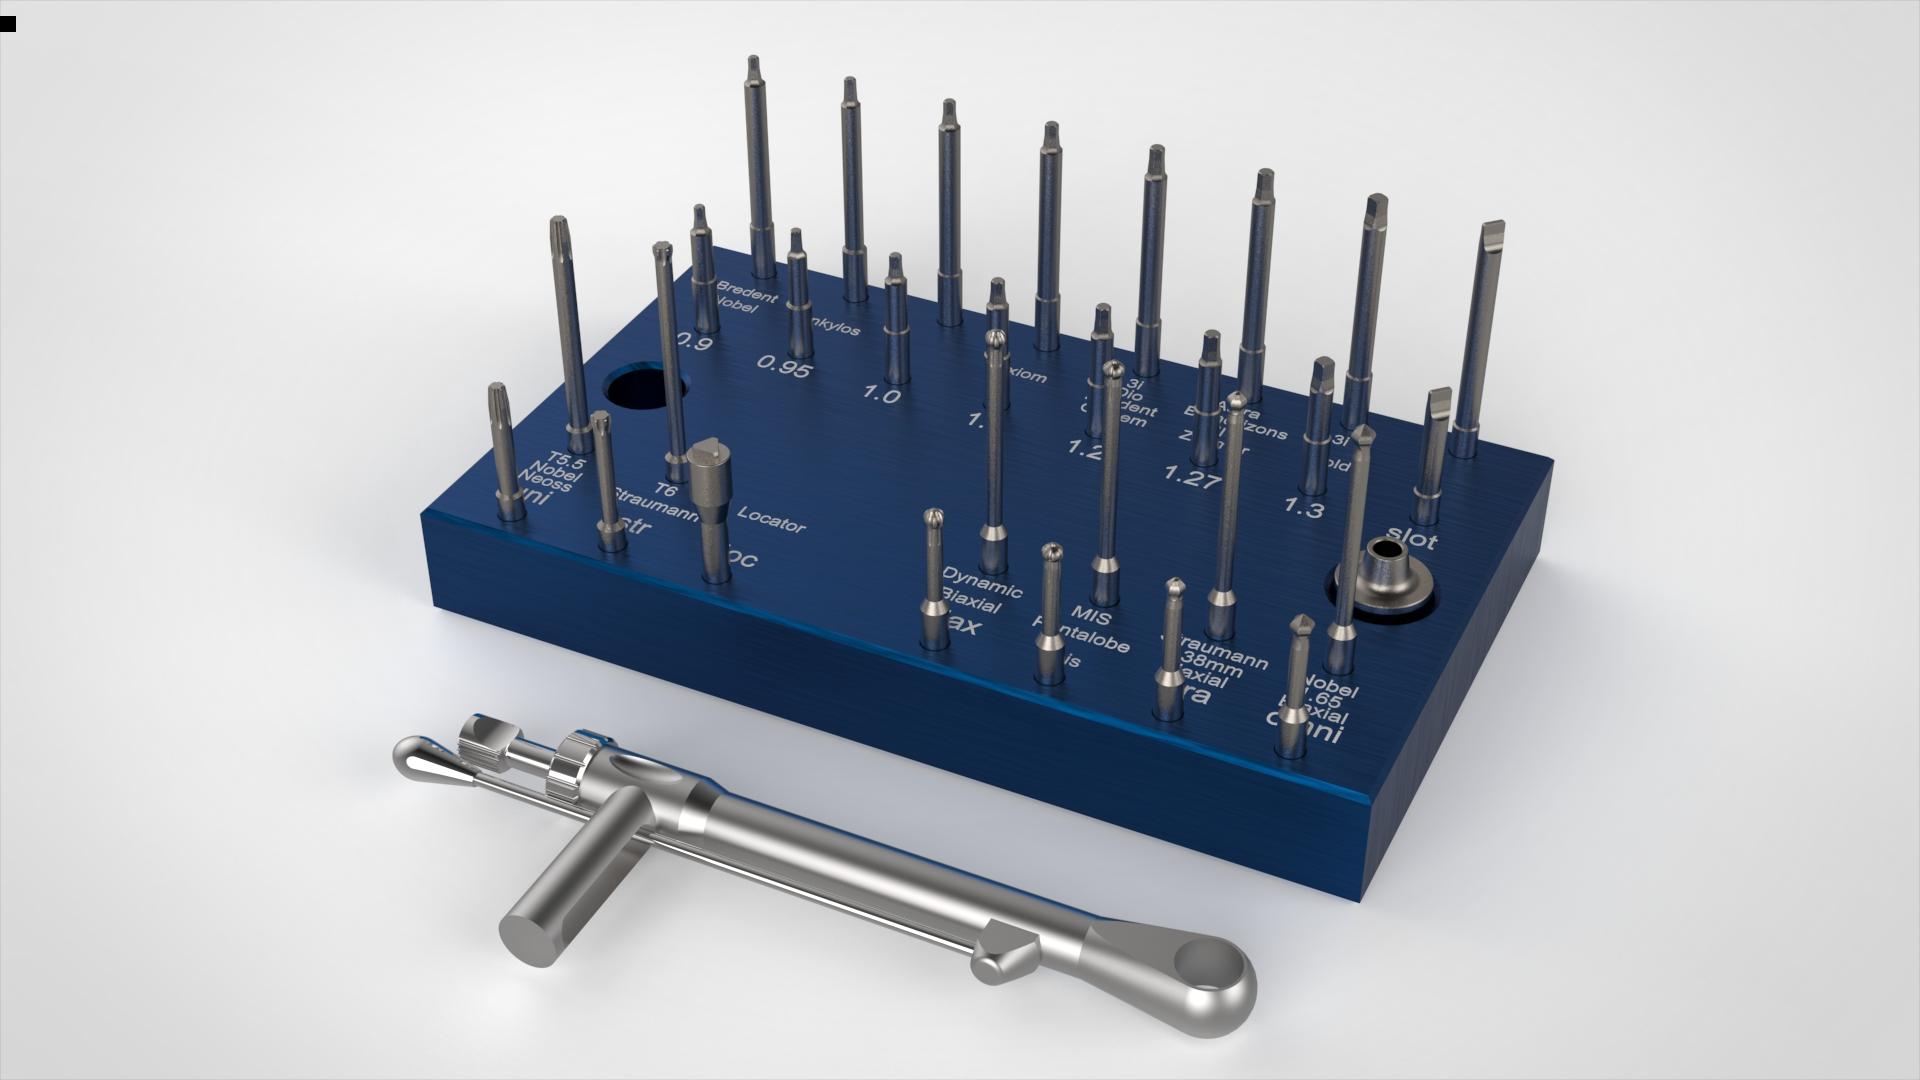 Blue implant set